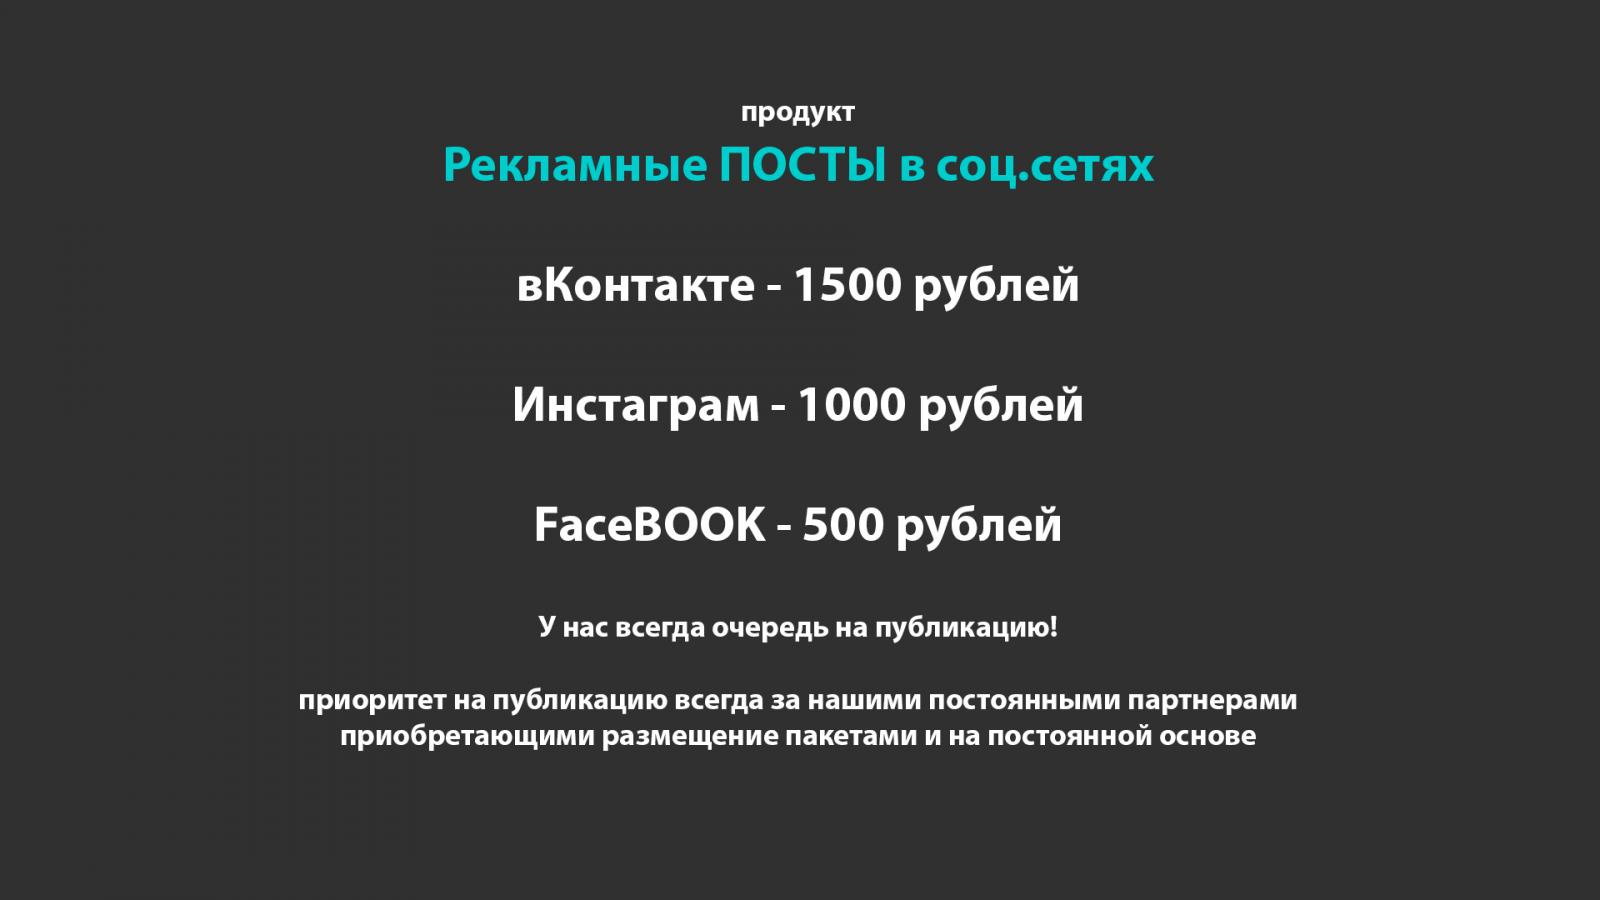 950 Презентация ЯКОСМЕТОЛОГ посты.png